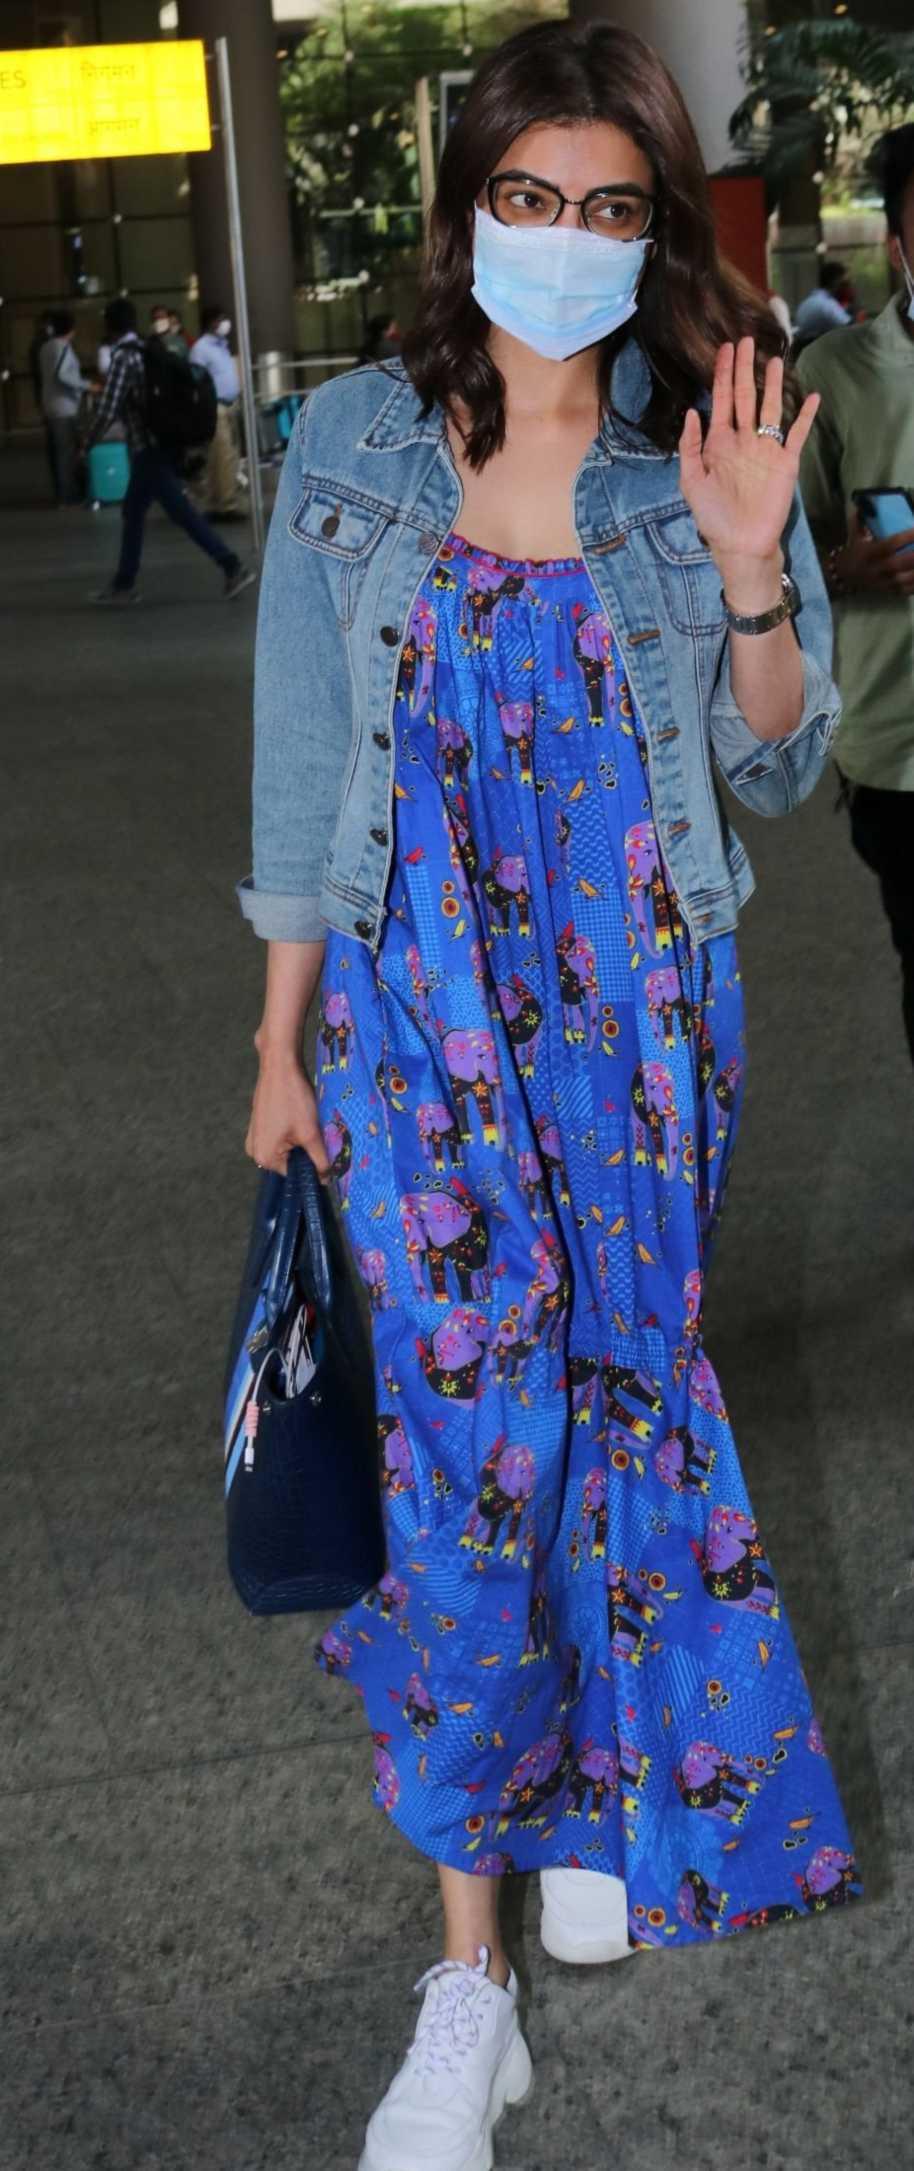 Kajal Aggarwal in a maxi dress by dandelion at mumbai airport